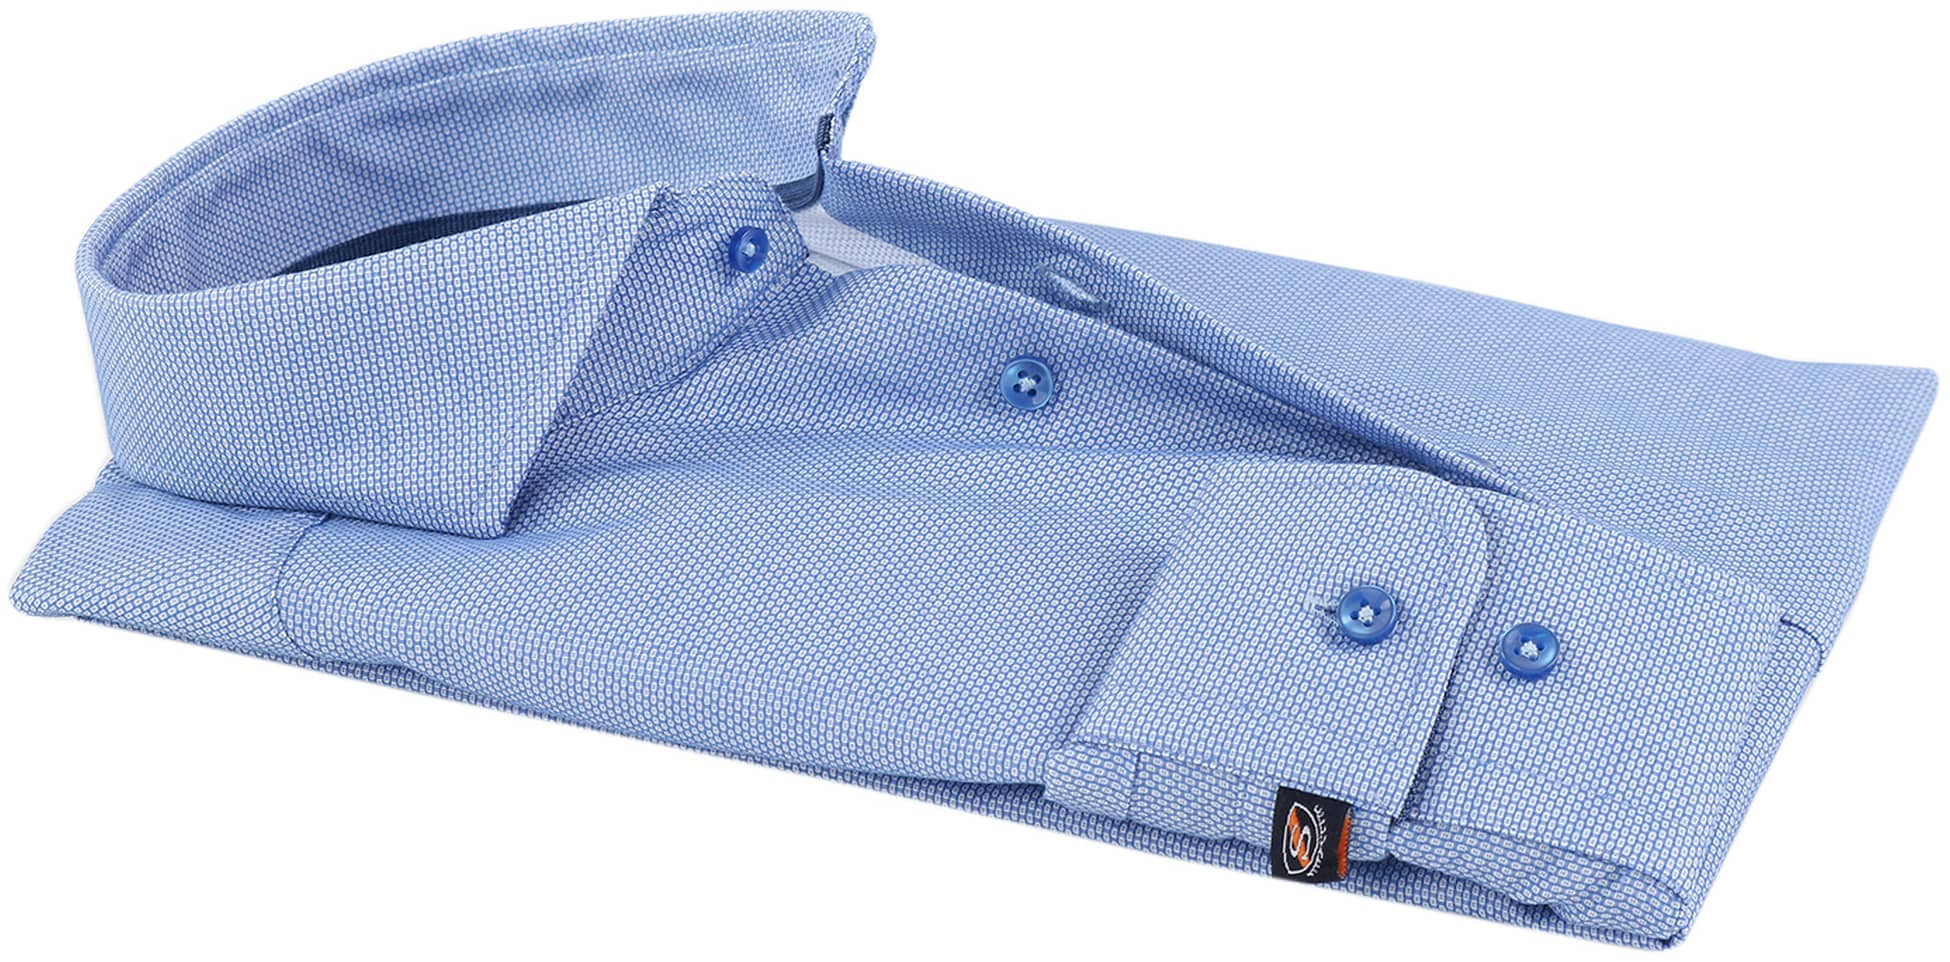 Mouwlengte 7 Overhemd Blauw 150-3 foto 2